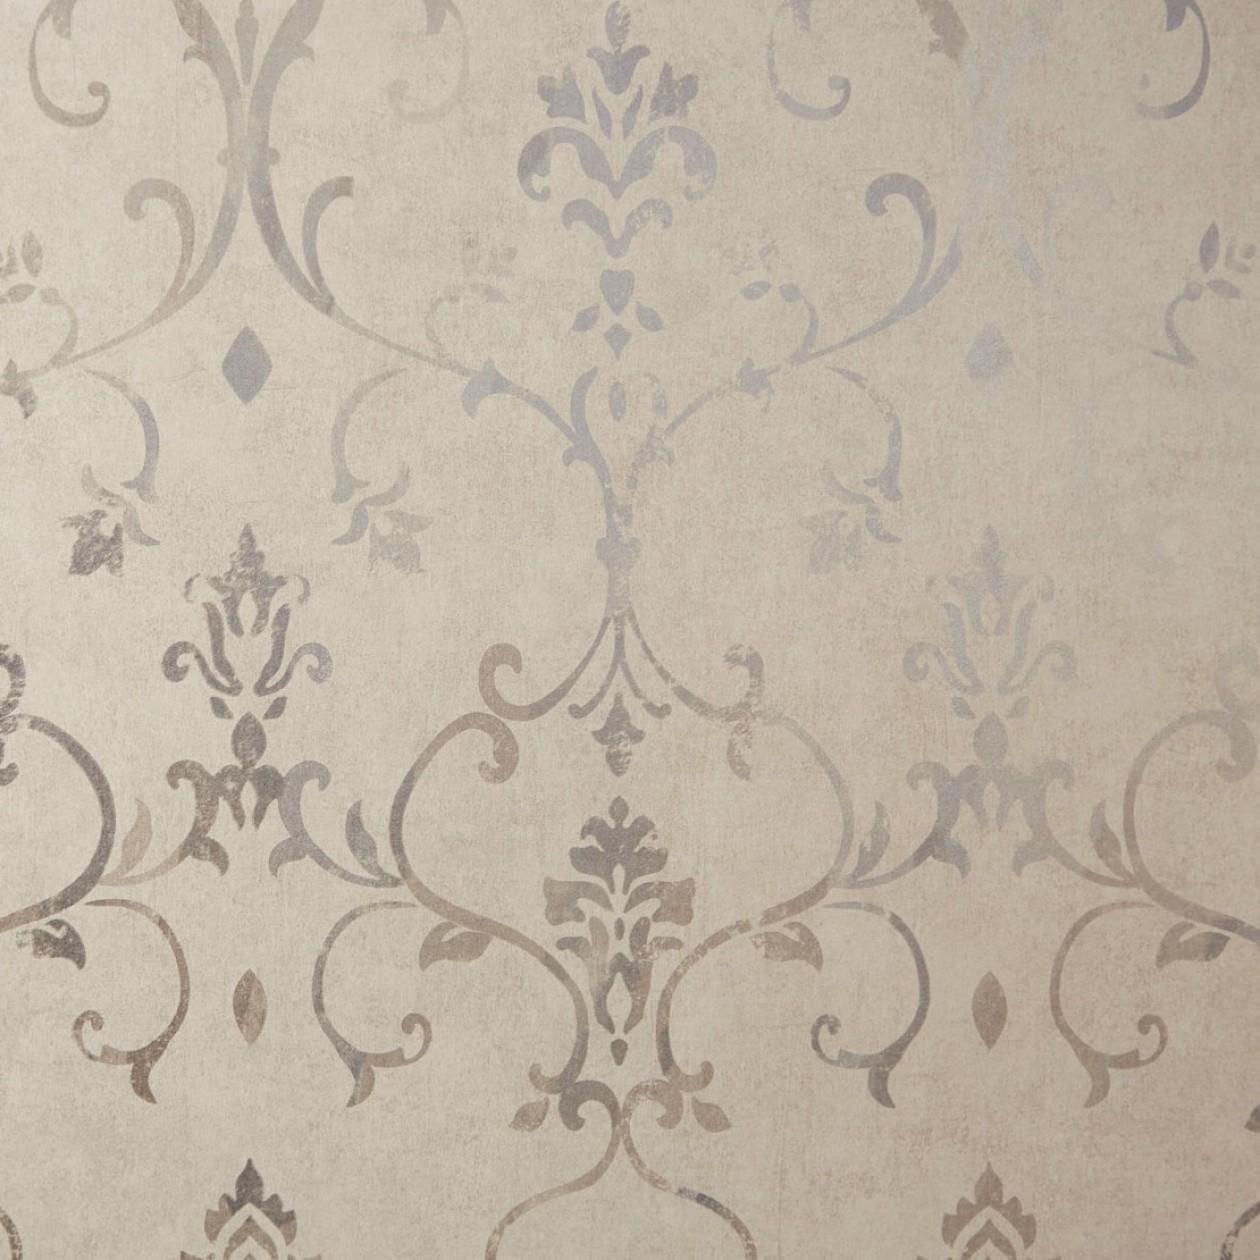 Французские обои Caselio,  коллекция Venise, артикулVEI65721100